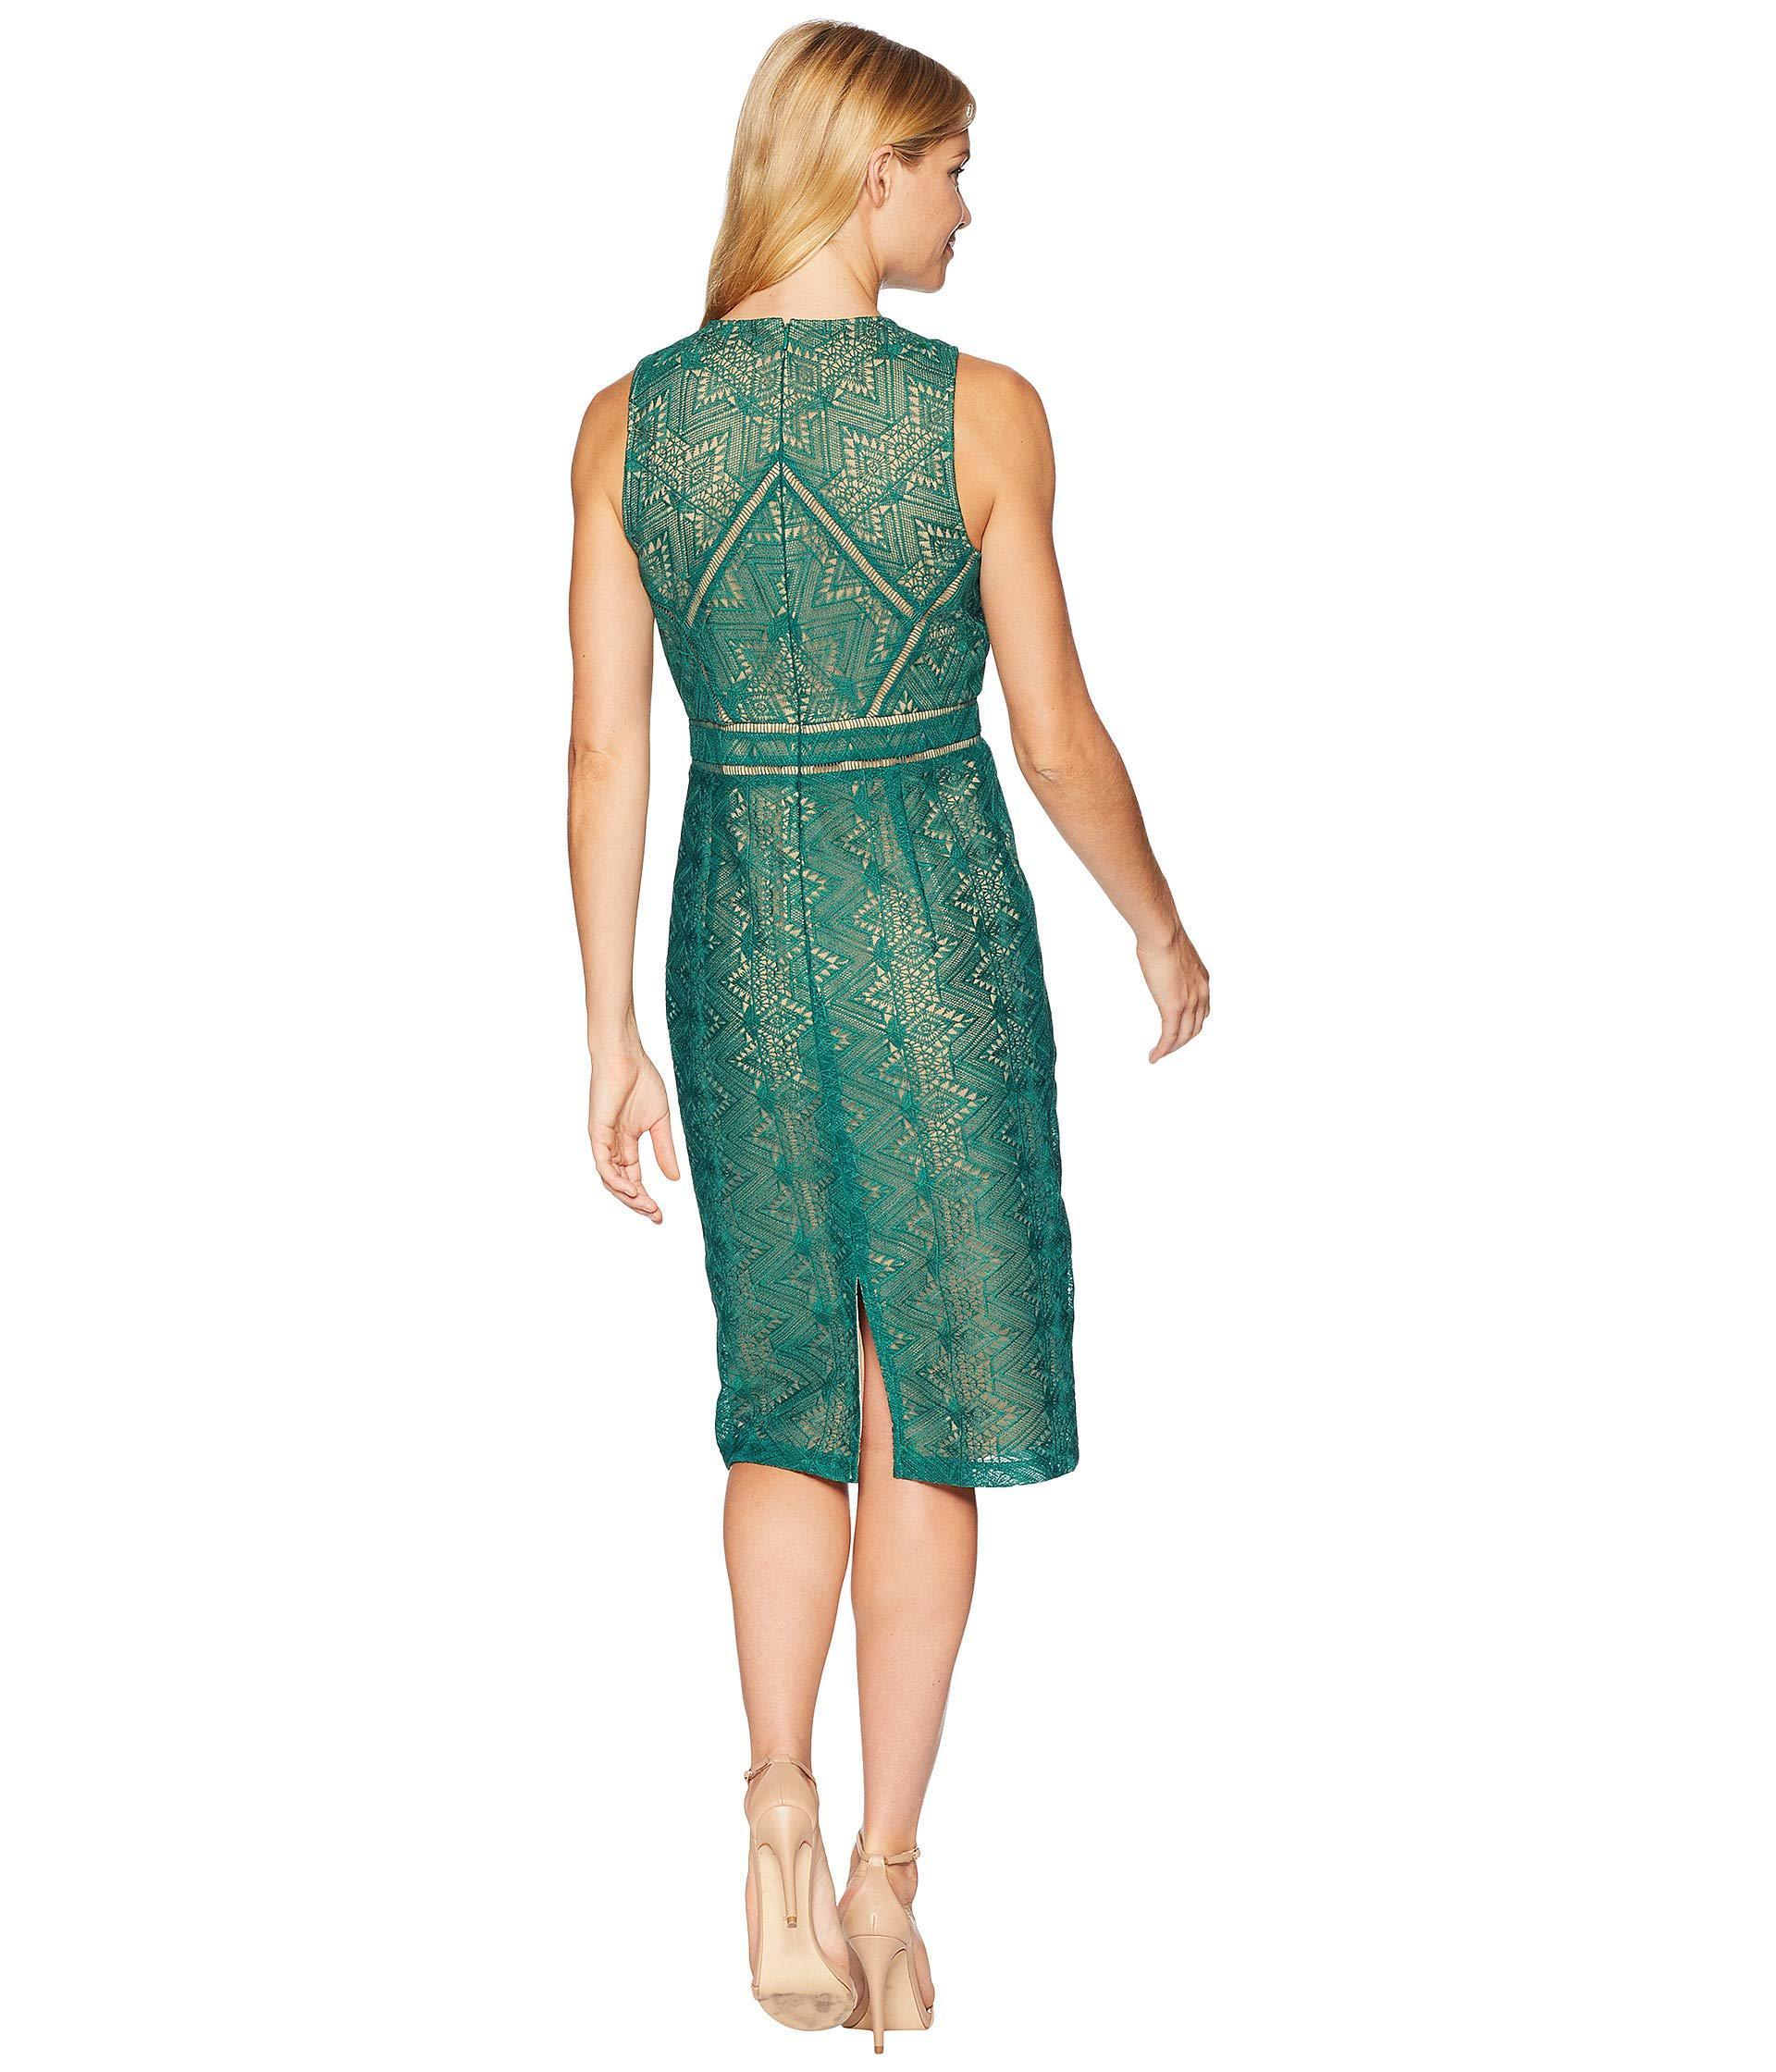 Eve Lace Dress Wild Green Dress